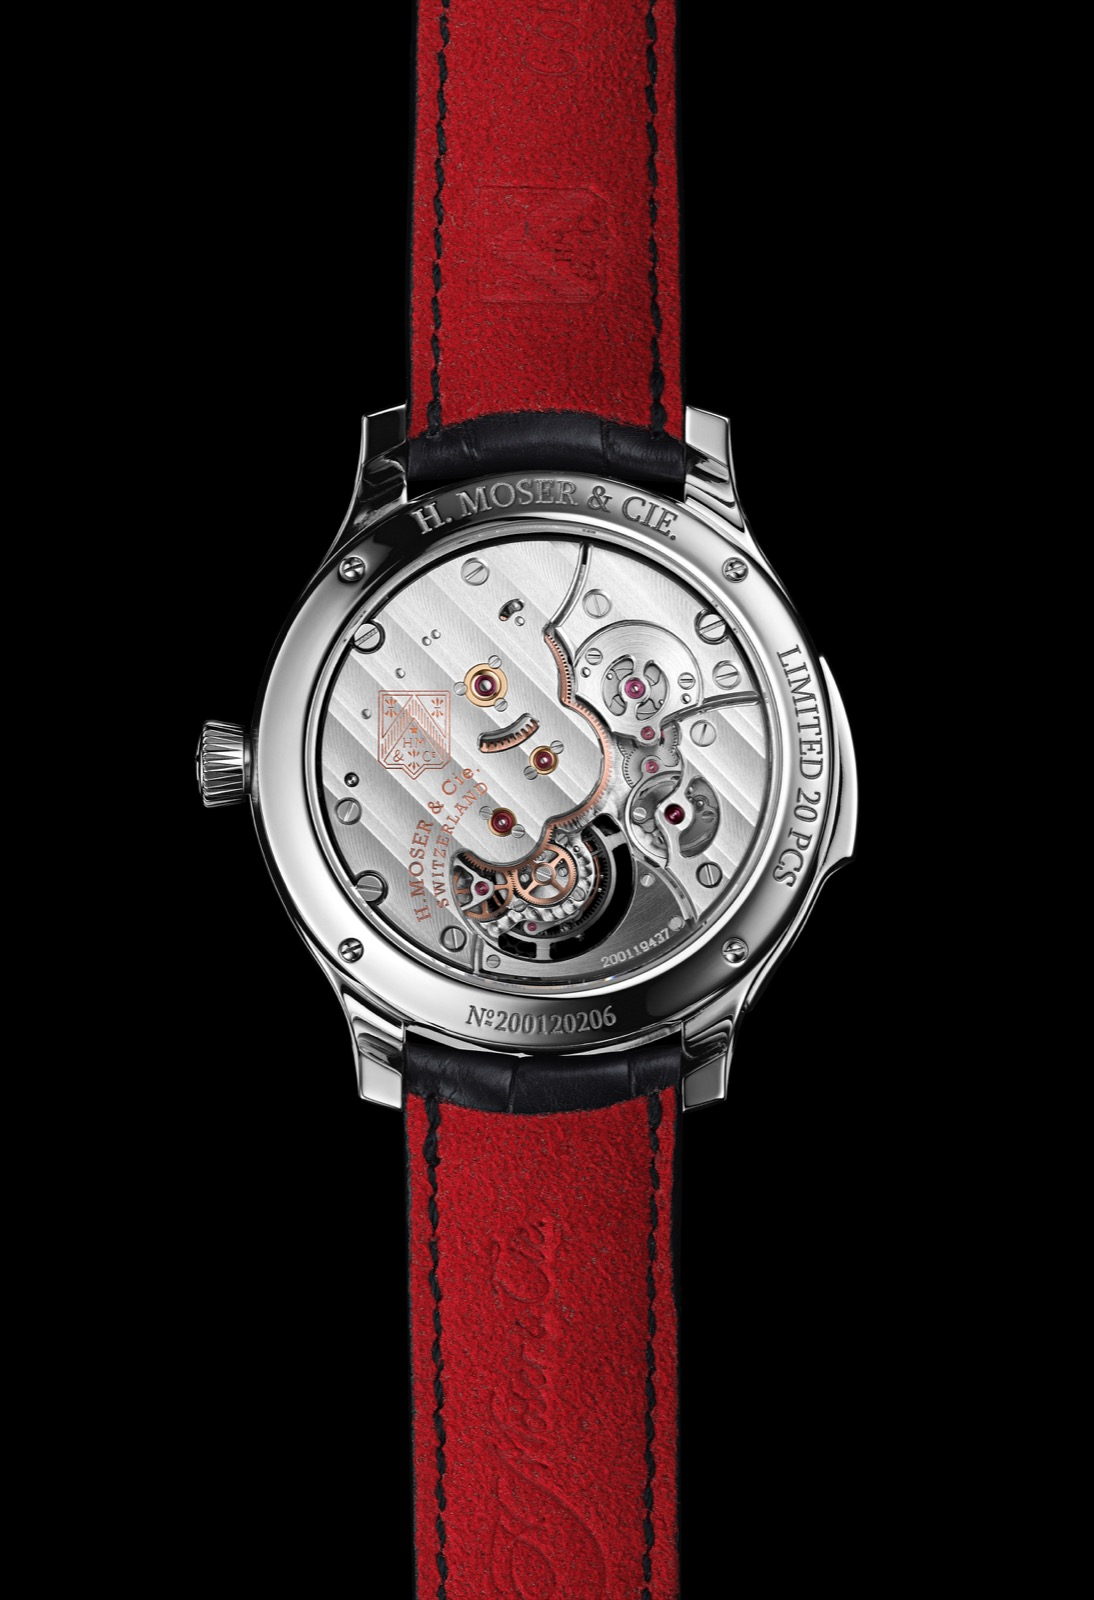 H. Moser & Cie. Endeavour Concept Minute Repeater Tourbillon - cal. 903